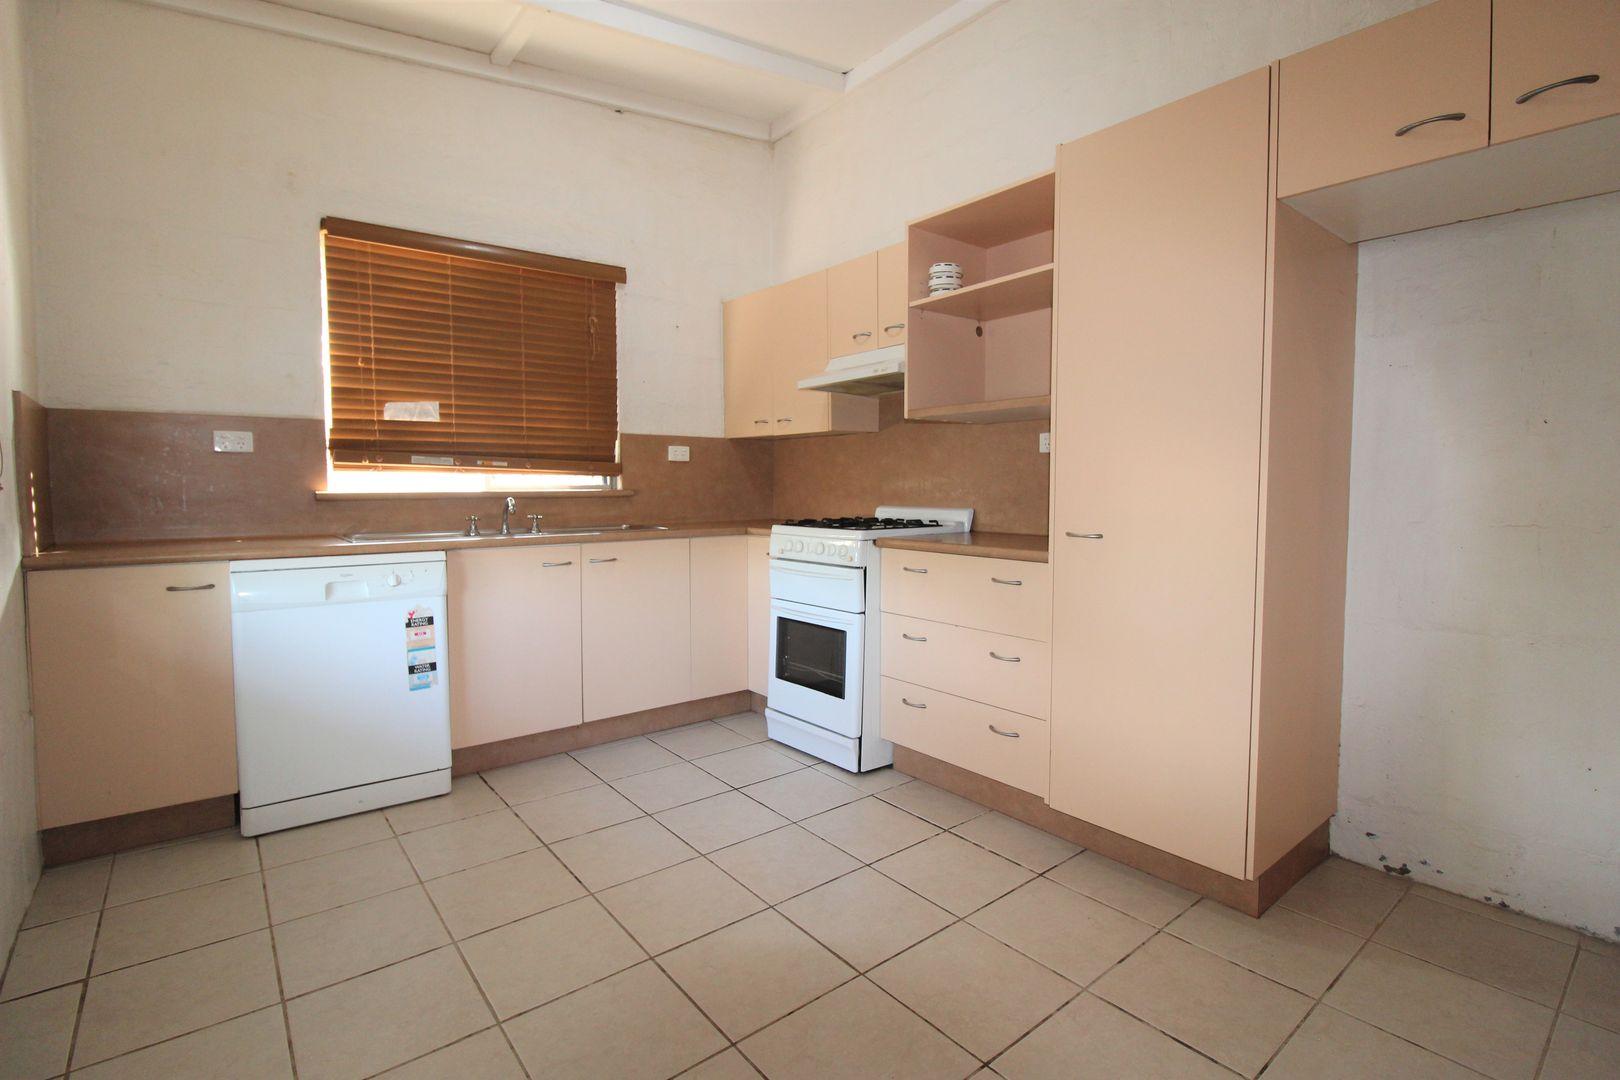 94 Simpson St, Mount Isa QLD 4825, Image 0